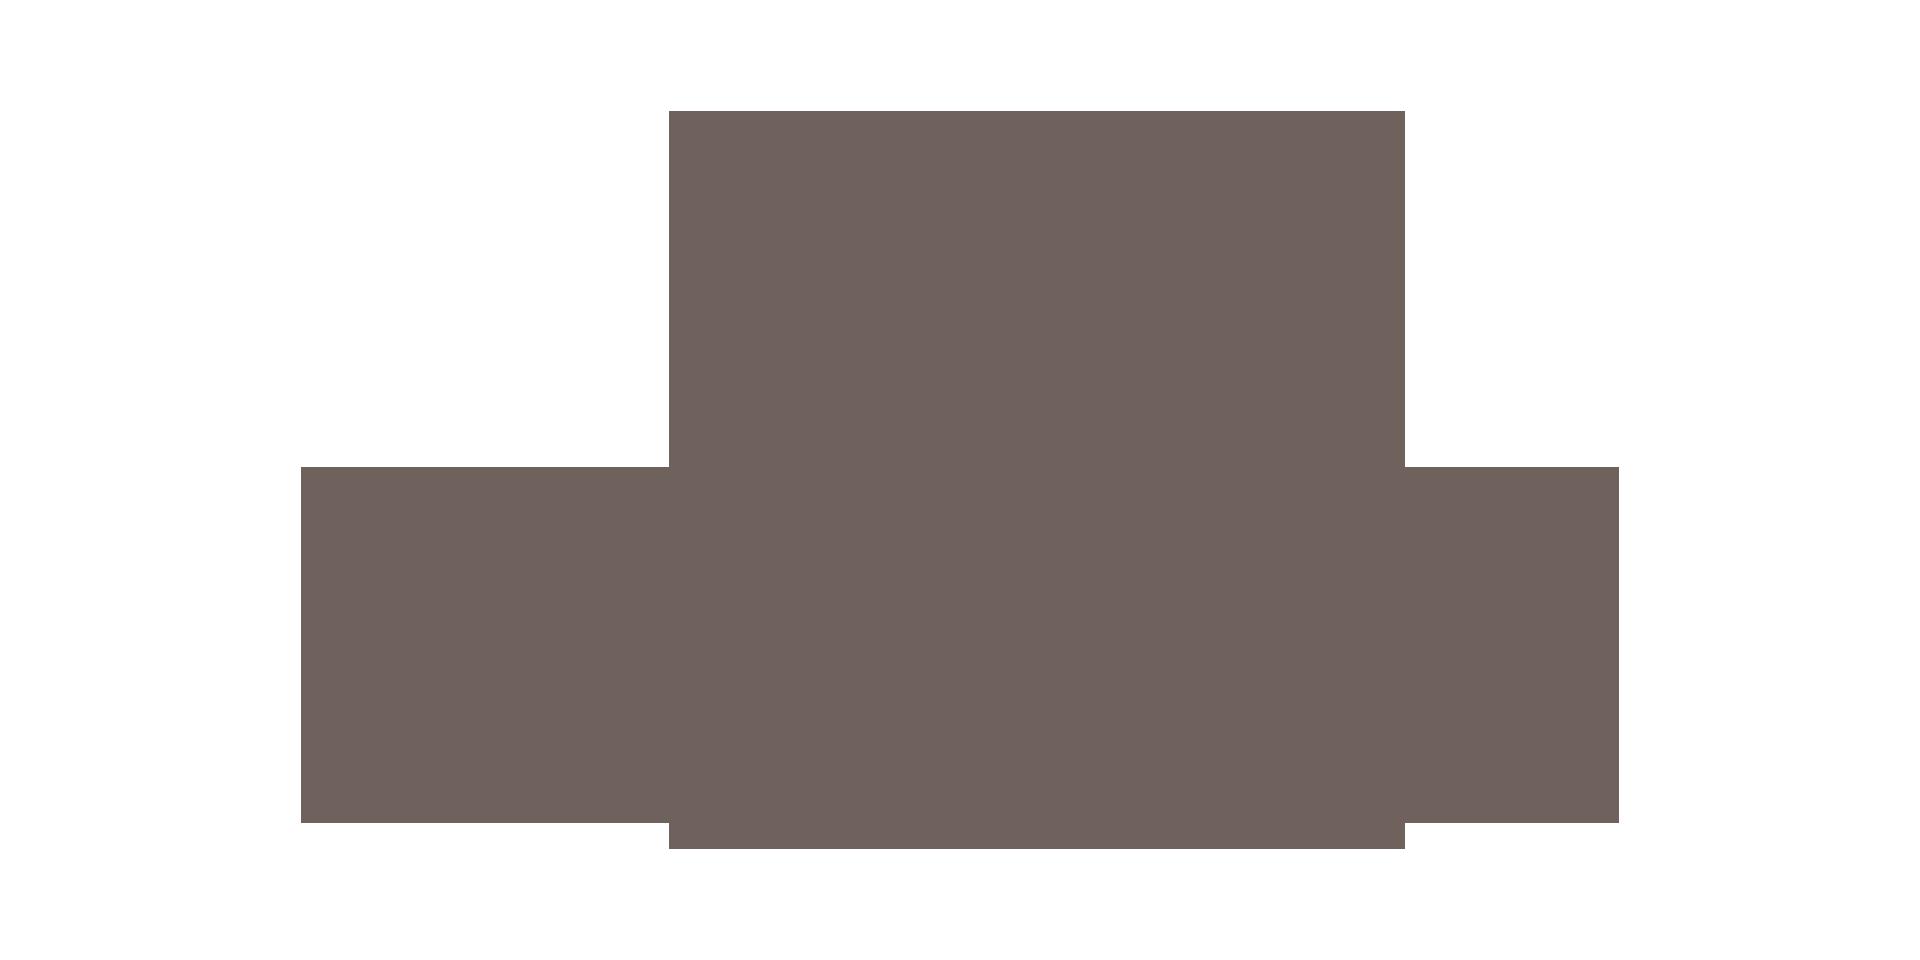 Sheraton Unveils New Logo Marking Transformation Milestone | Marriott News  Center